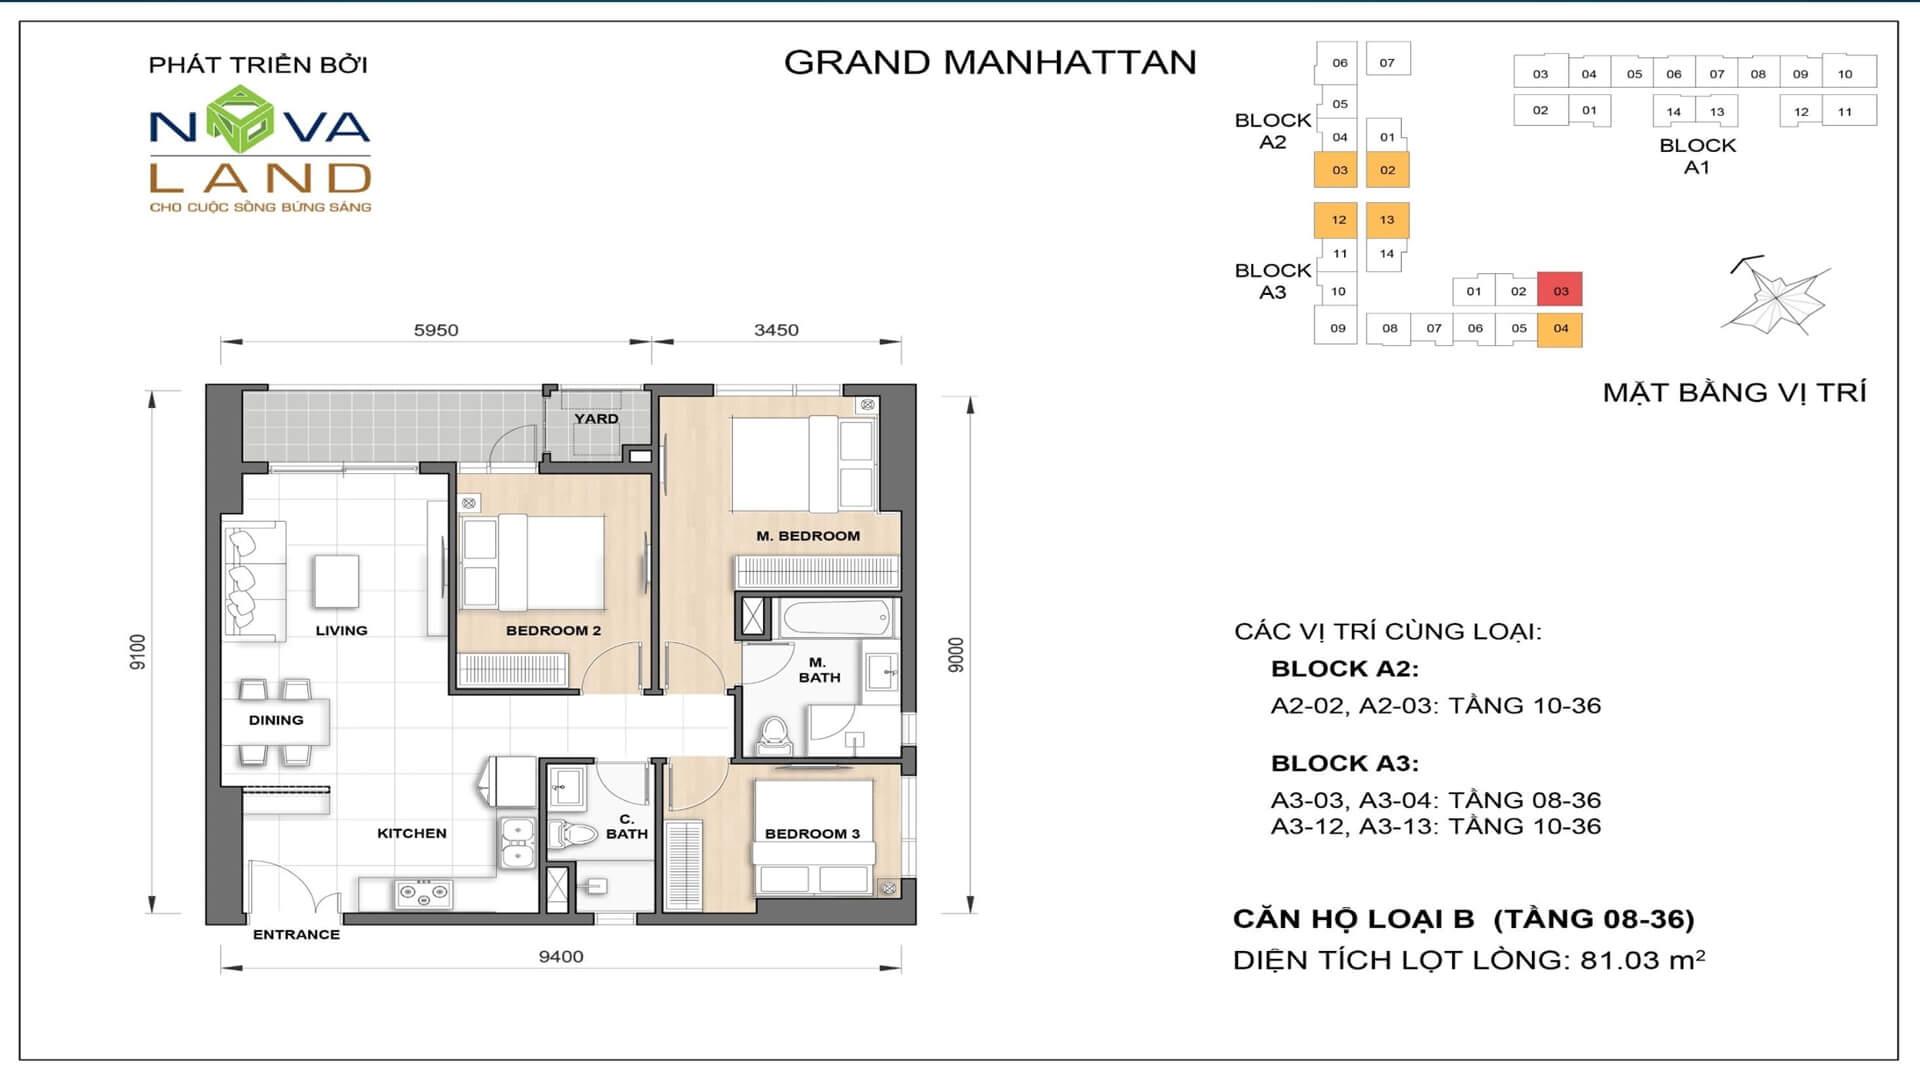 Ban-Ve-Ky-Thuat-Can-Ho-Du-An-Grand-Manhattan-Q1-HCM-Novaland-dien-tich-lot-long-81.03m2